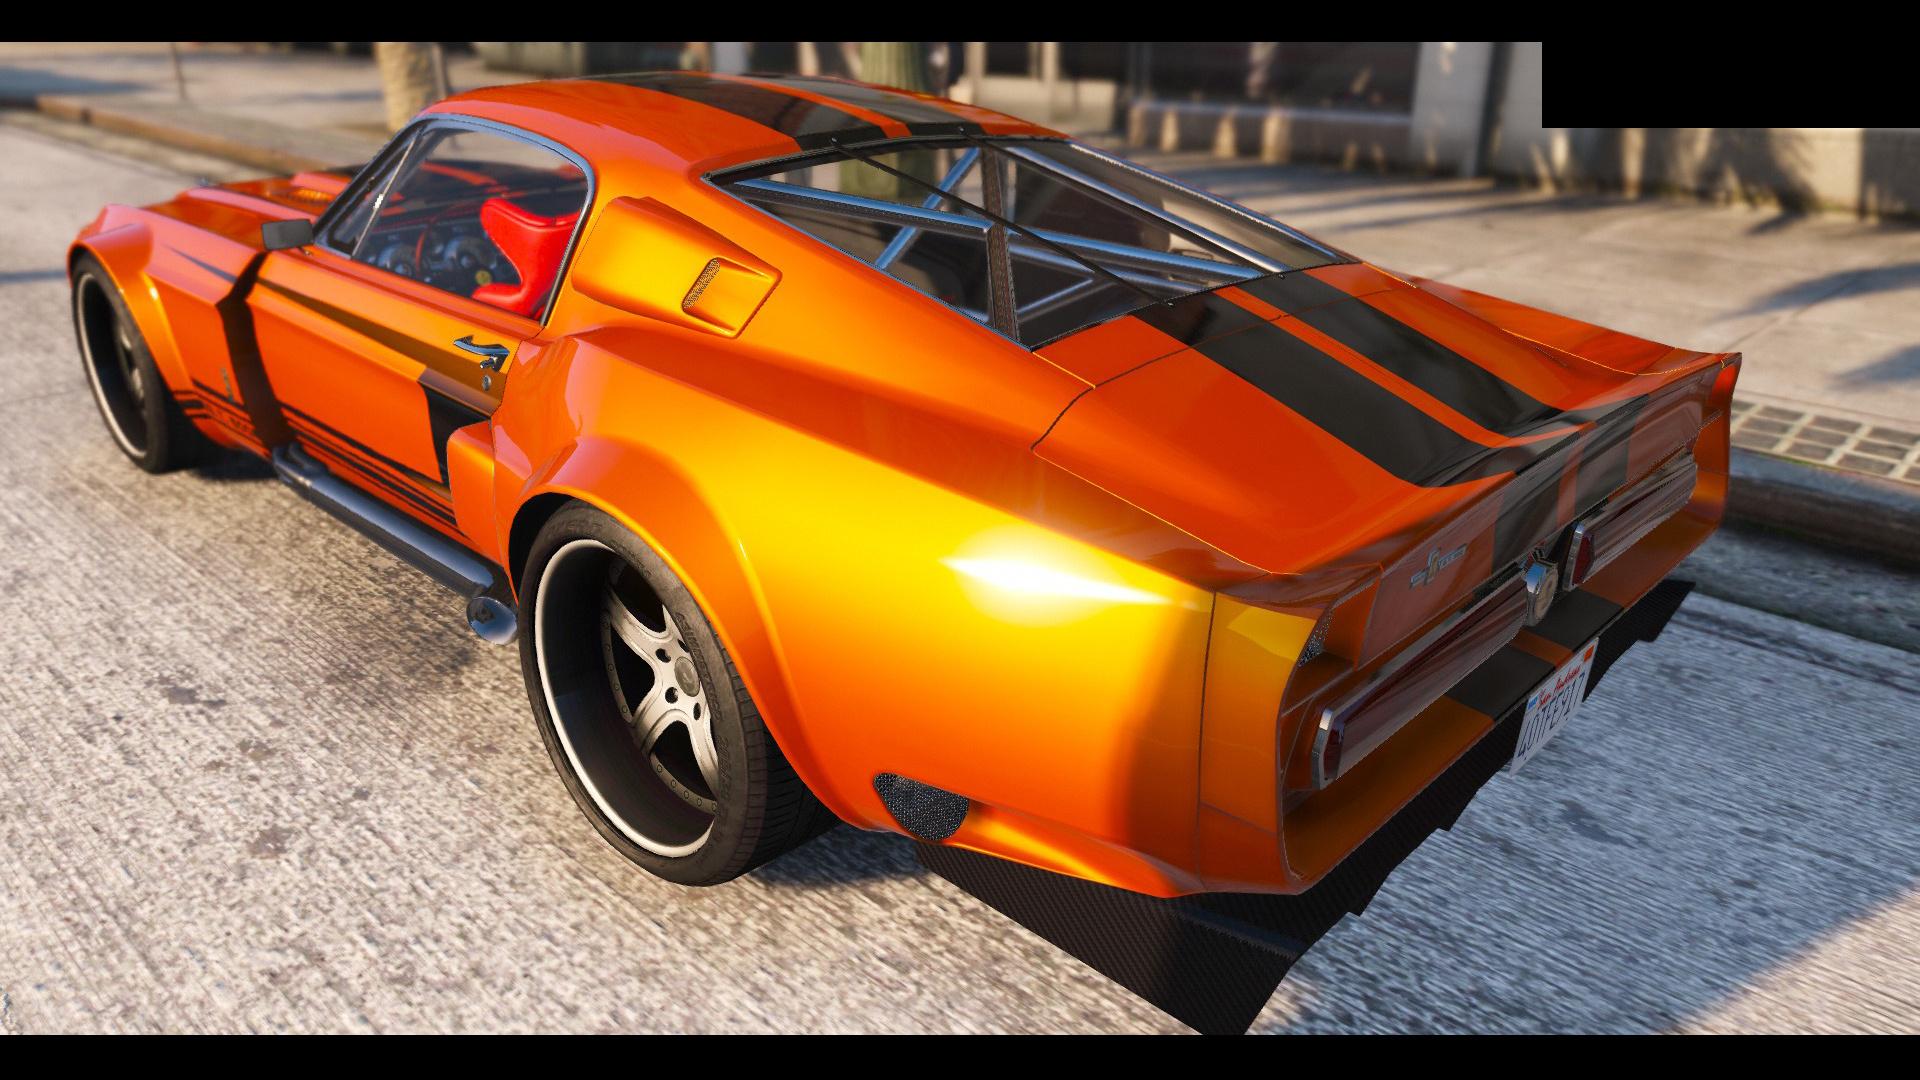 1967 Shelby Mustang Gt500 Hq Tuning Gta5 Mods Com